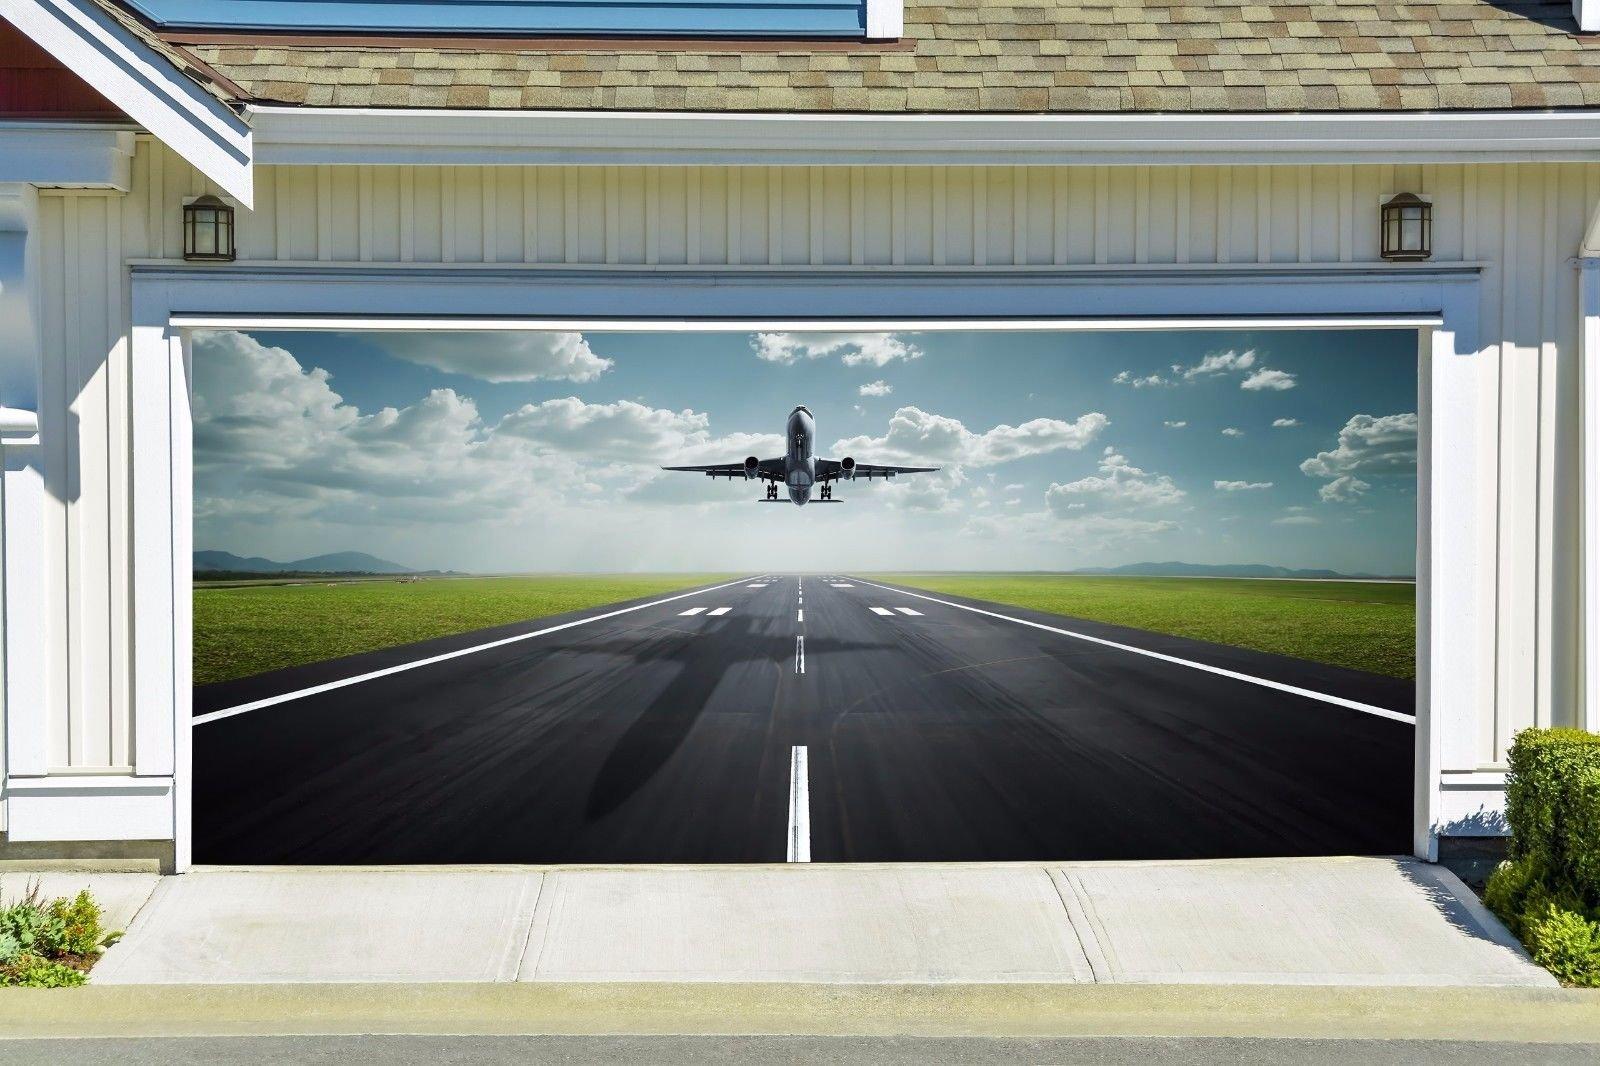 Aircraft Garage Mural Door Cover Outdoor for 2 Car Decor Billboard for House Garage Door Decor Banner 3D Airplane Art Made in the USA Murals size 82x188 Dav83